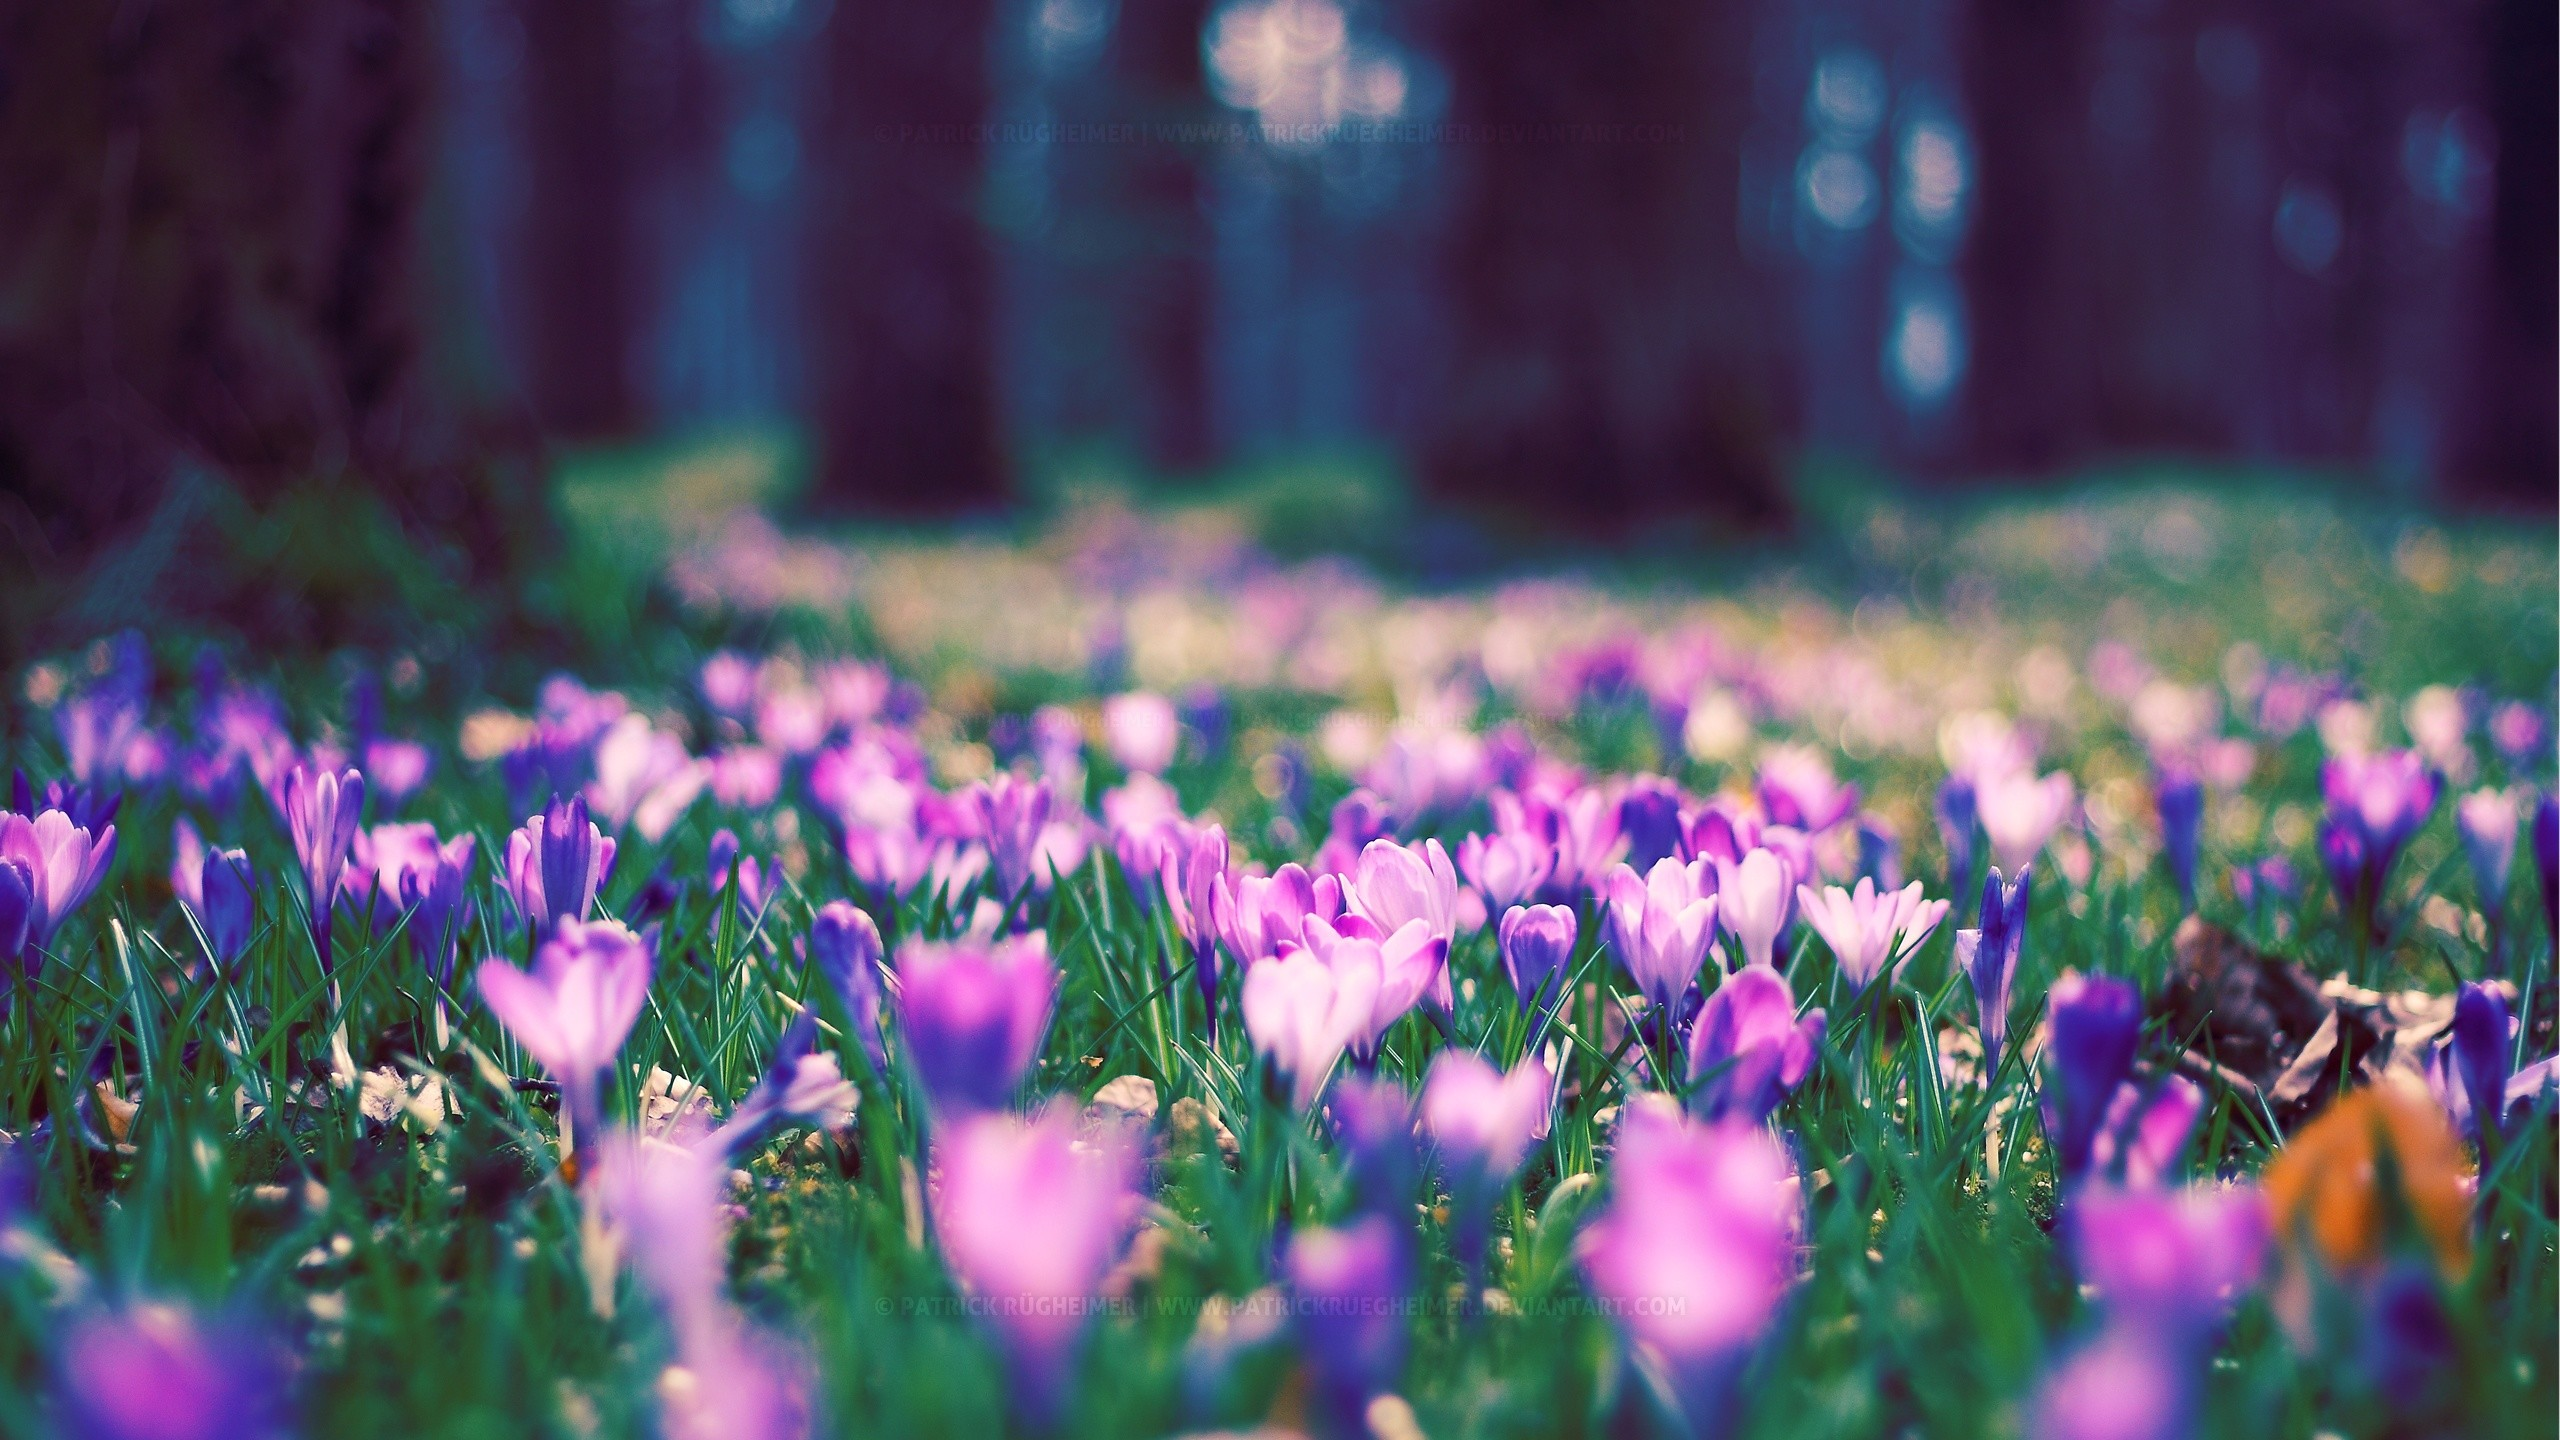 Res: 2560x1440, Spring Flower Park Spring Flower Park · Spring Park Wallpaper Spring Nature